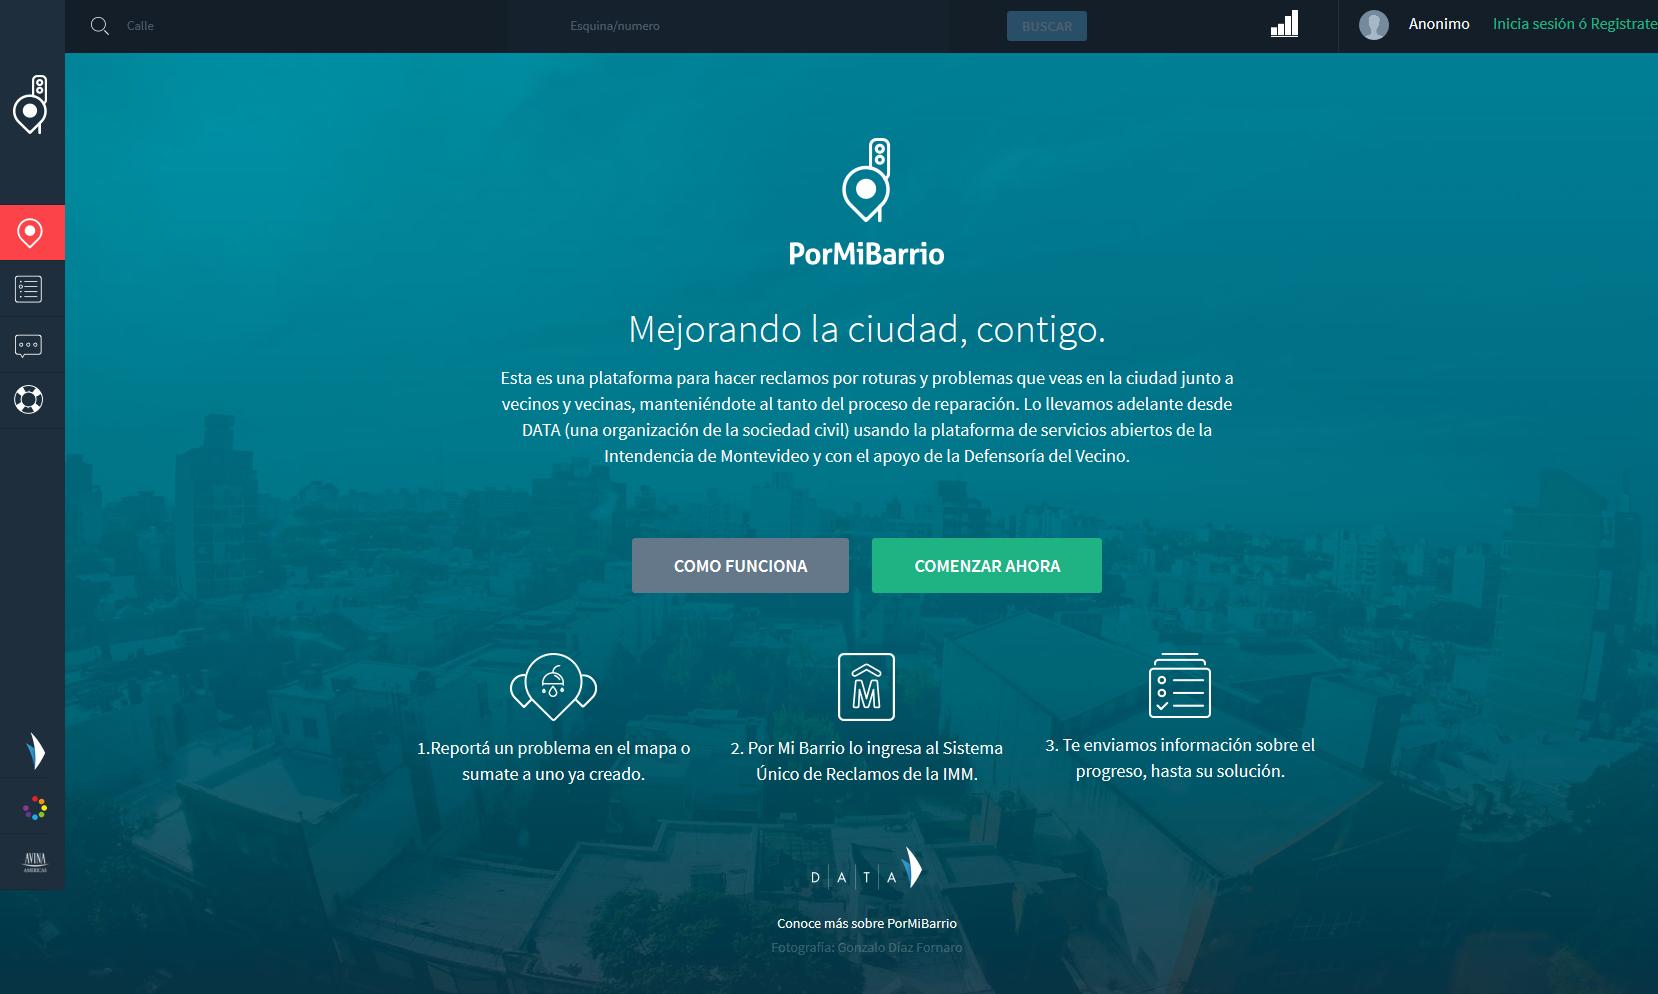 Por Mi Barrio, Uruguayan FixMyStreet